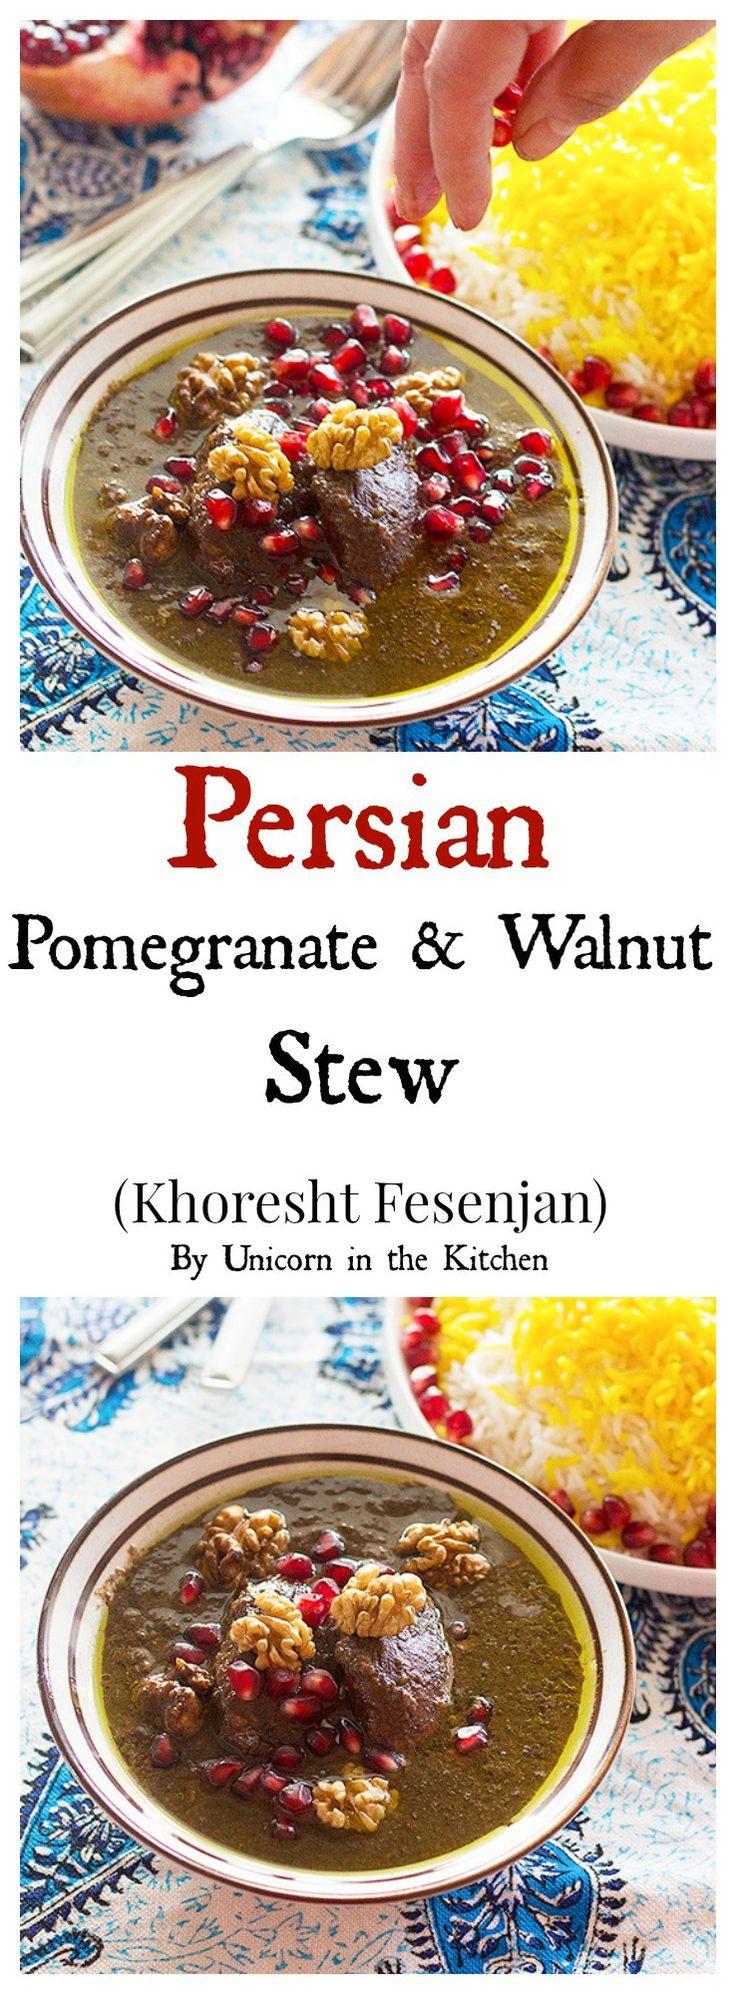 Khoresht Fesenjan - Persian Pomegranate and Walnut Stew ... Persian Pomegranate Rice